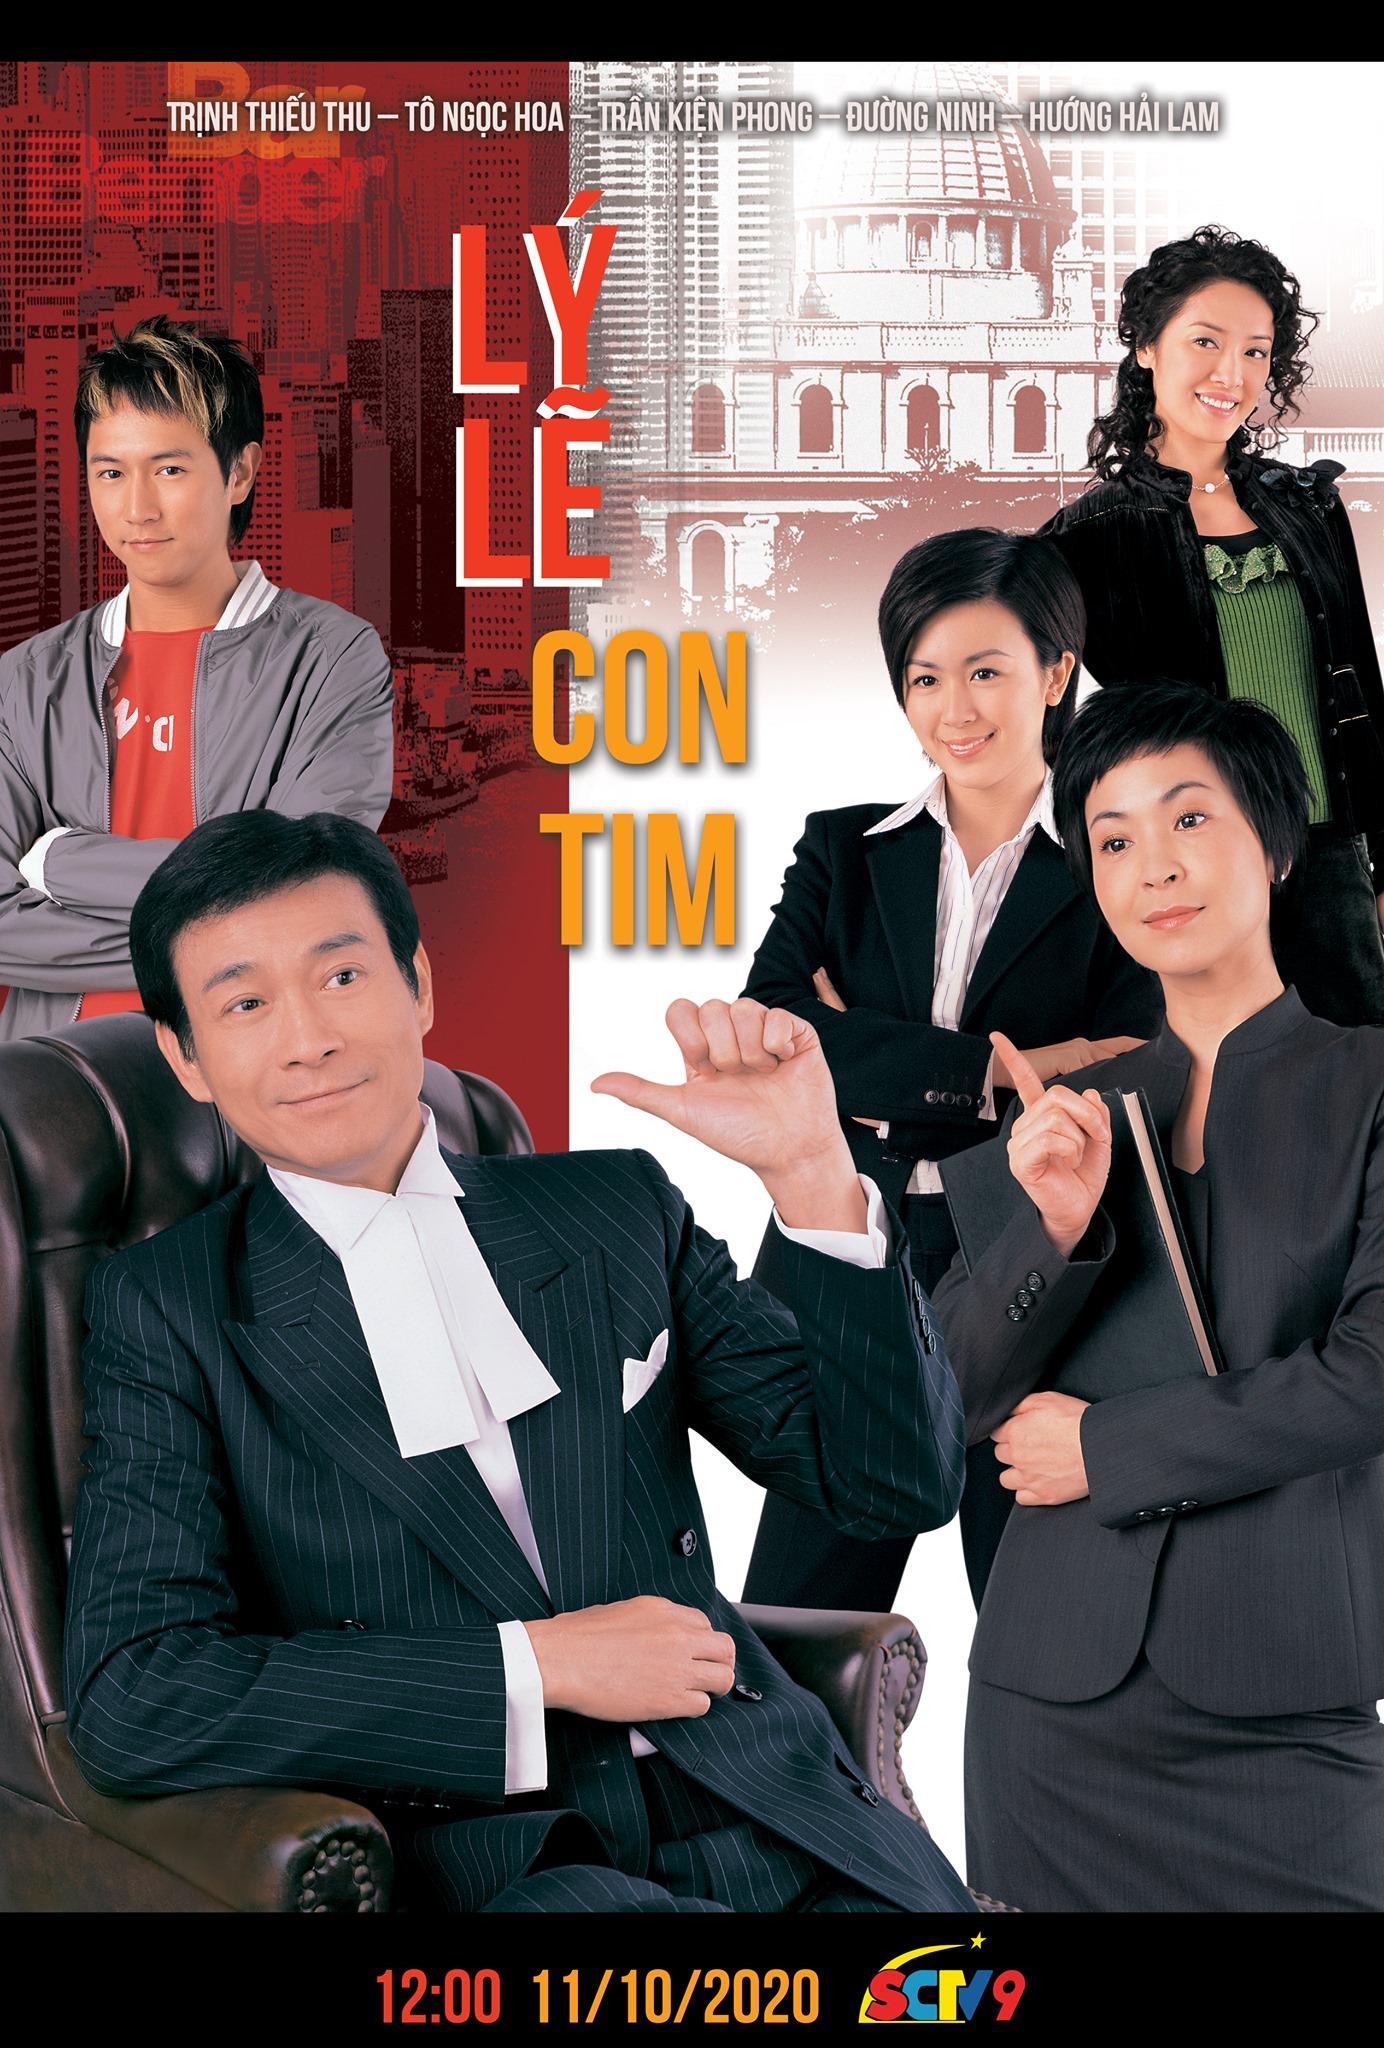 Lý Lẽ Con Tim - SCTV9 (2020)